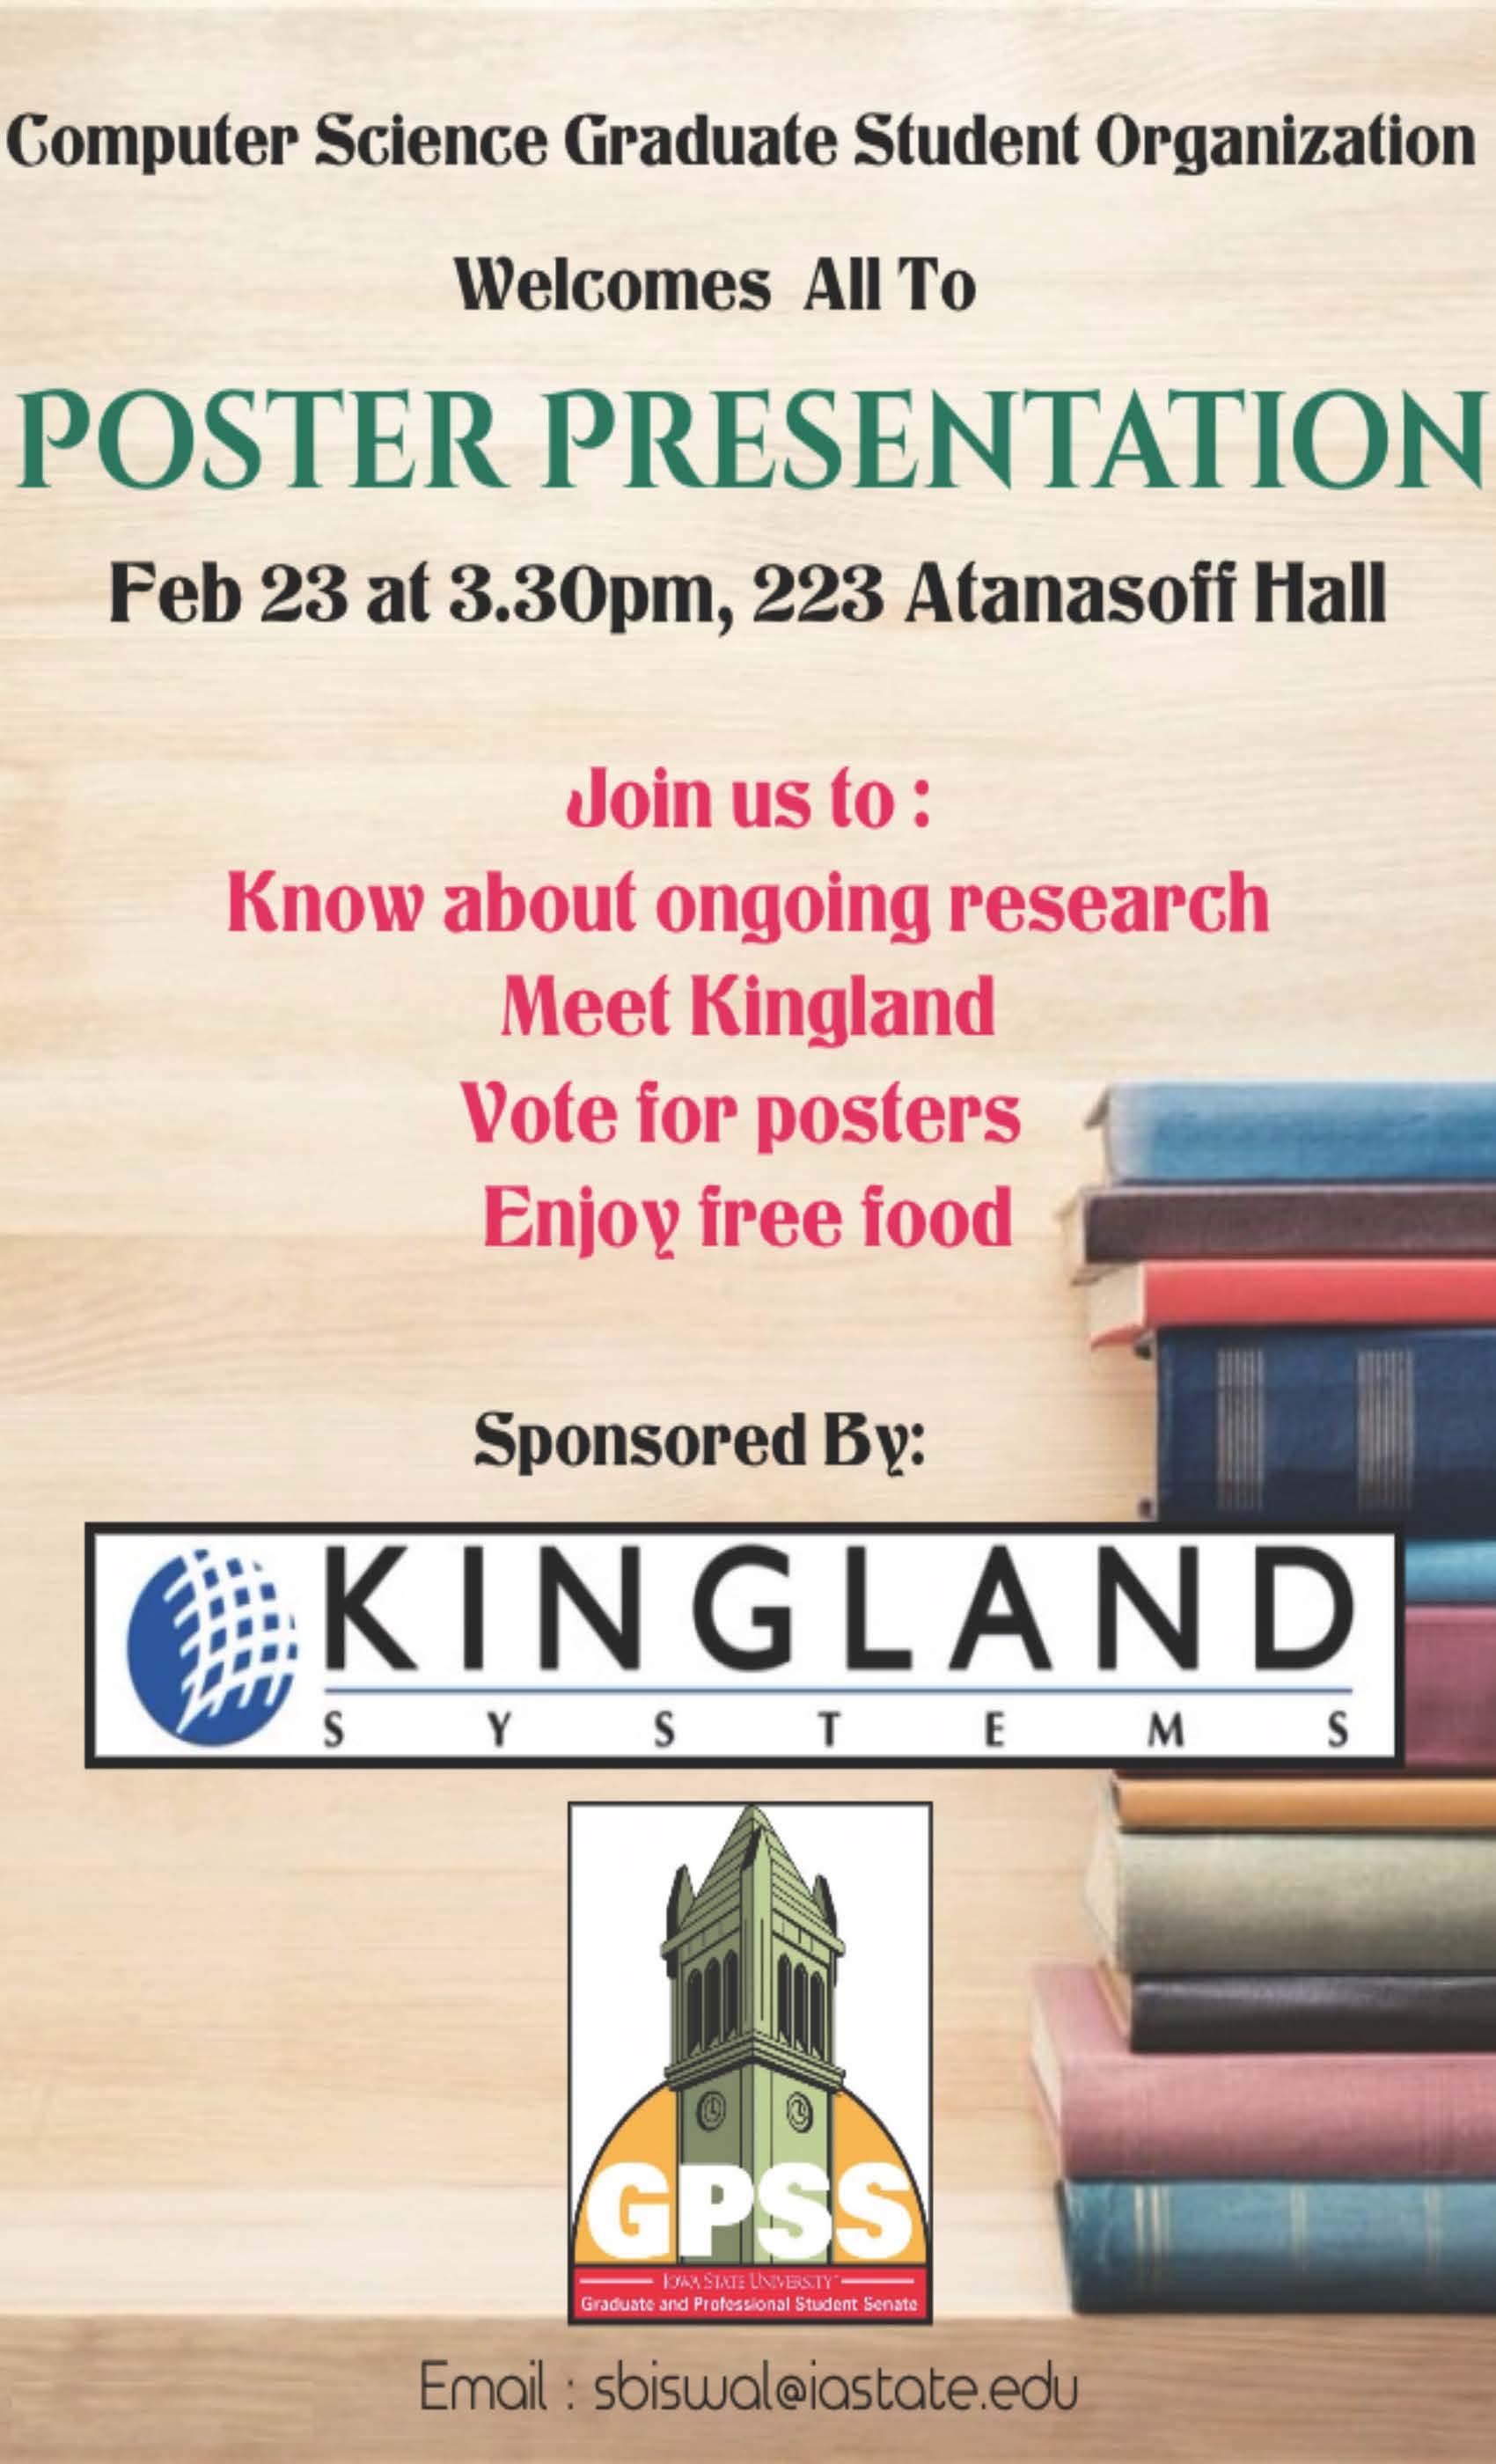 Poster Presentation Flyer February 23rd